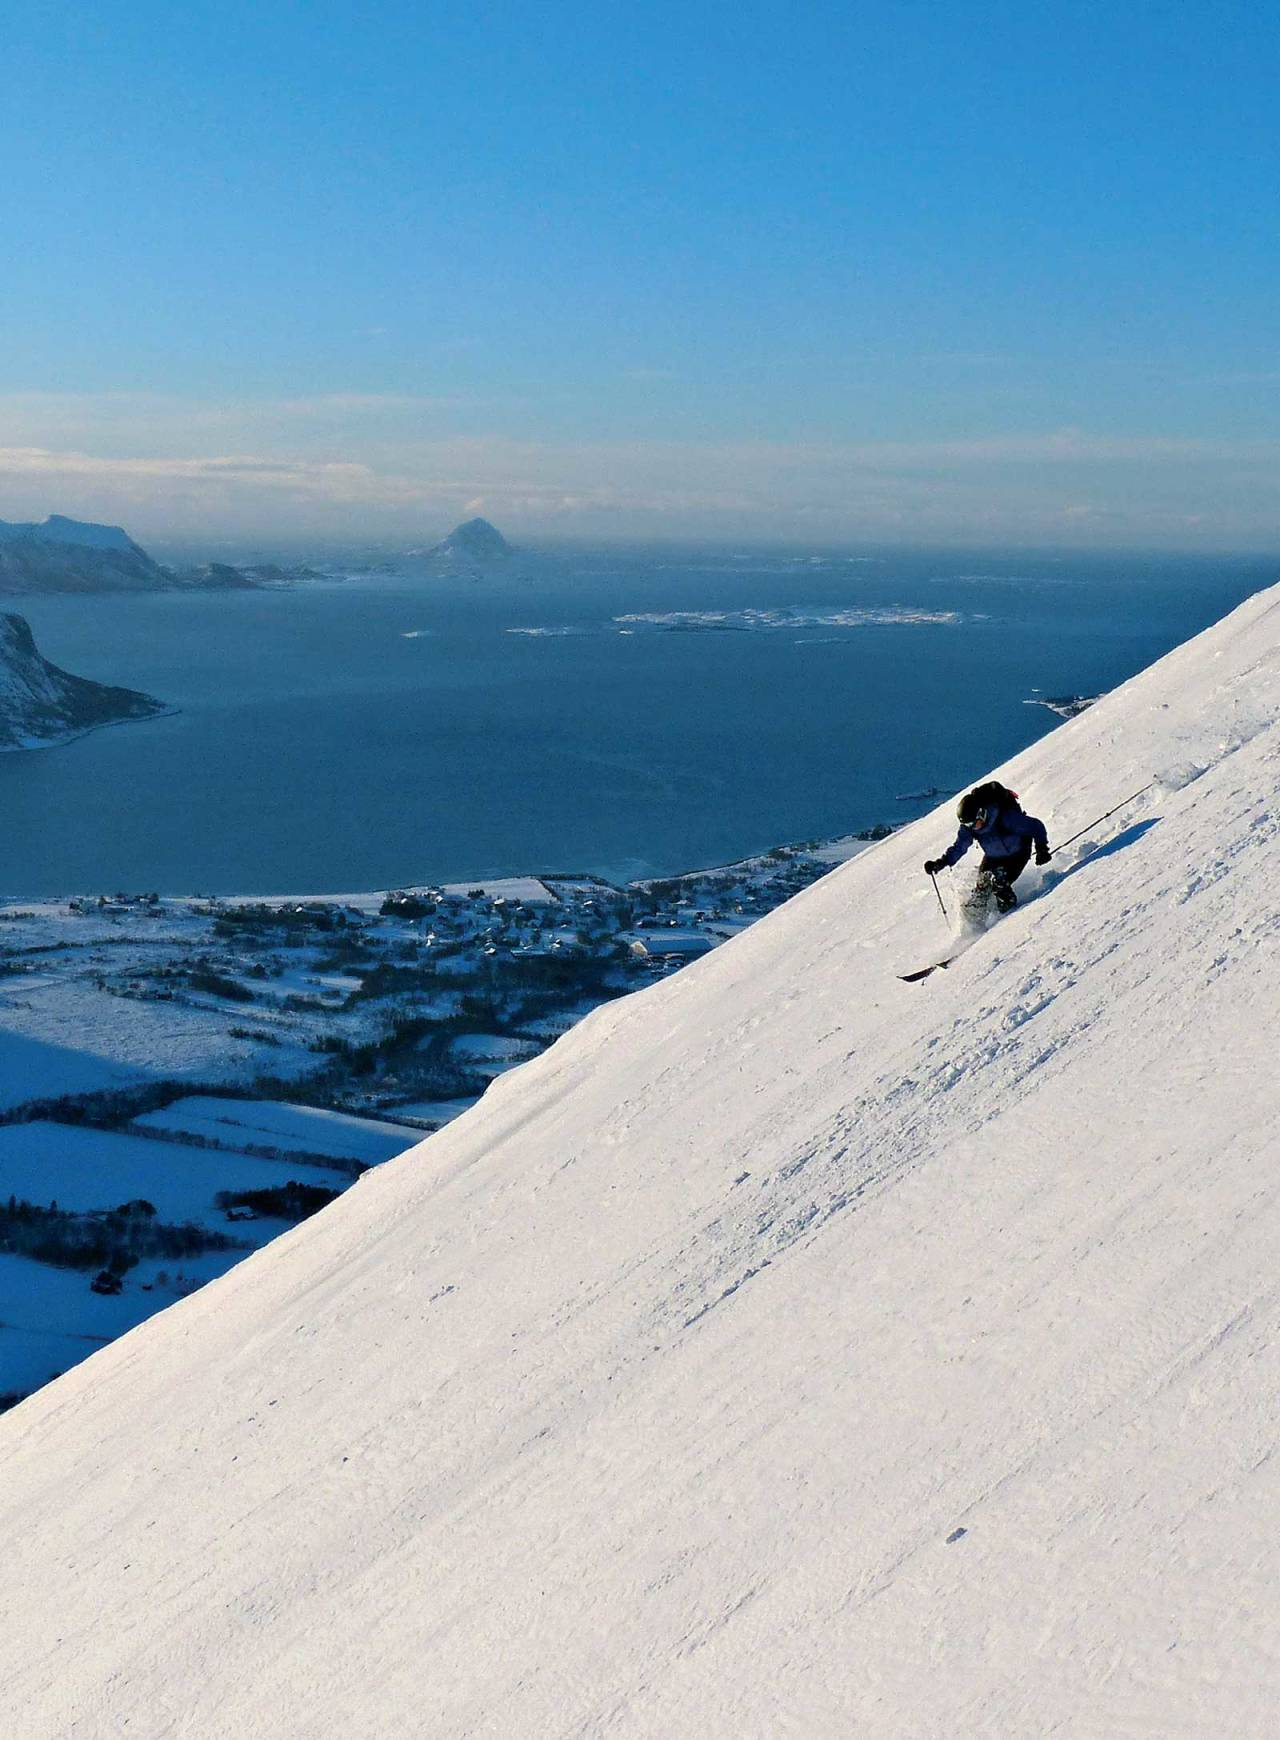 Per Arne Segtnan nyter februarsnøen ned sydflanken på Breidtinden. Foto: Torgeir Kjus. / Toppturer rundt Bodø.